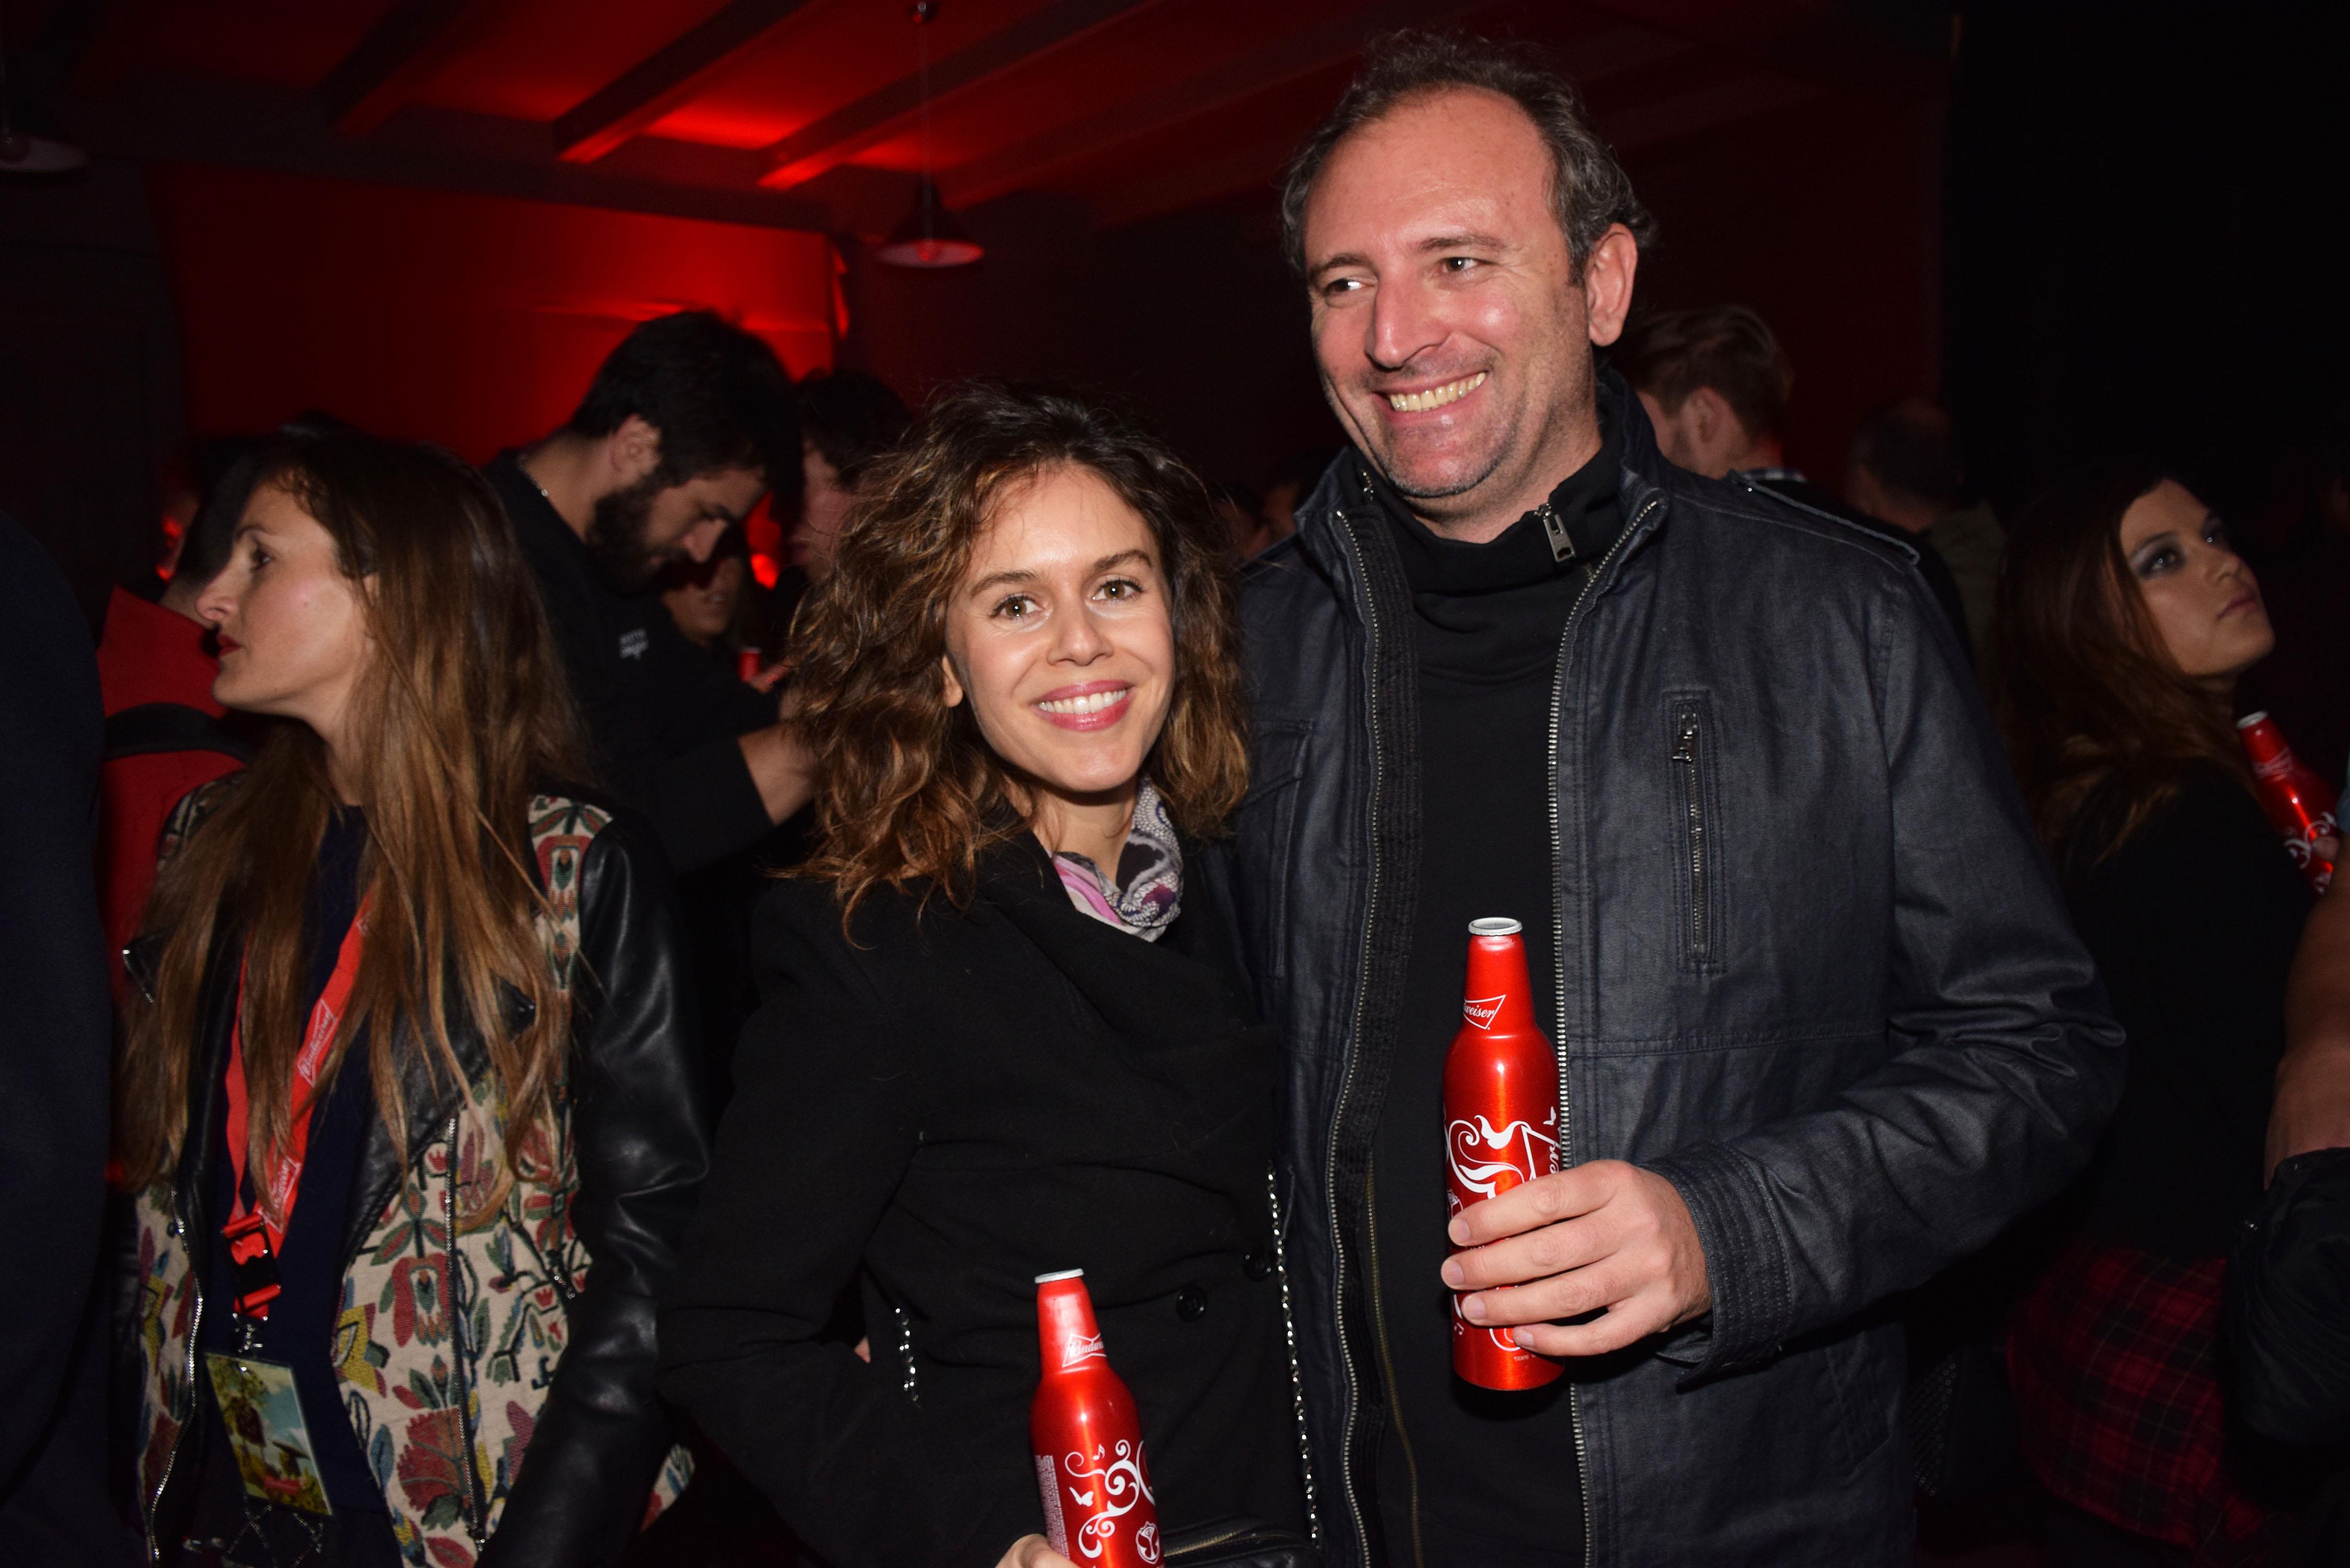 Carola Varleta y su marido Kabir Engel